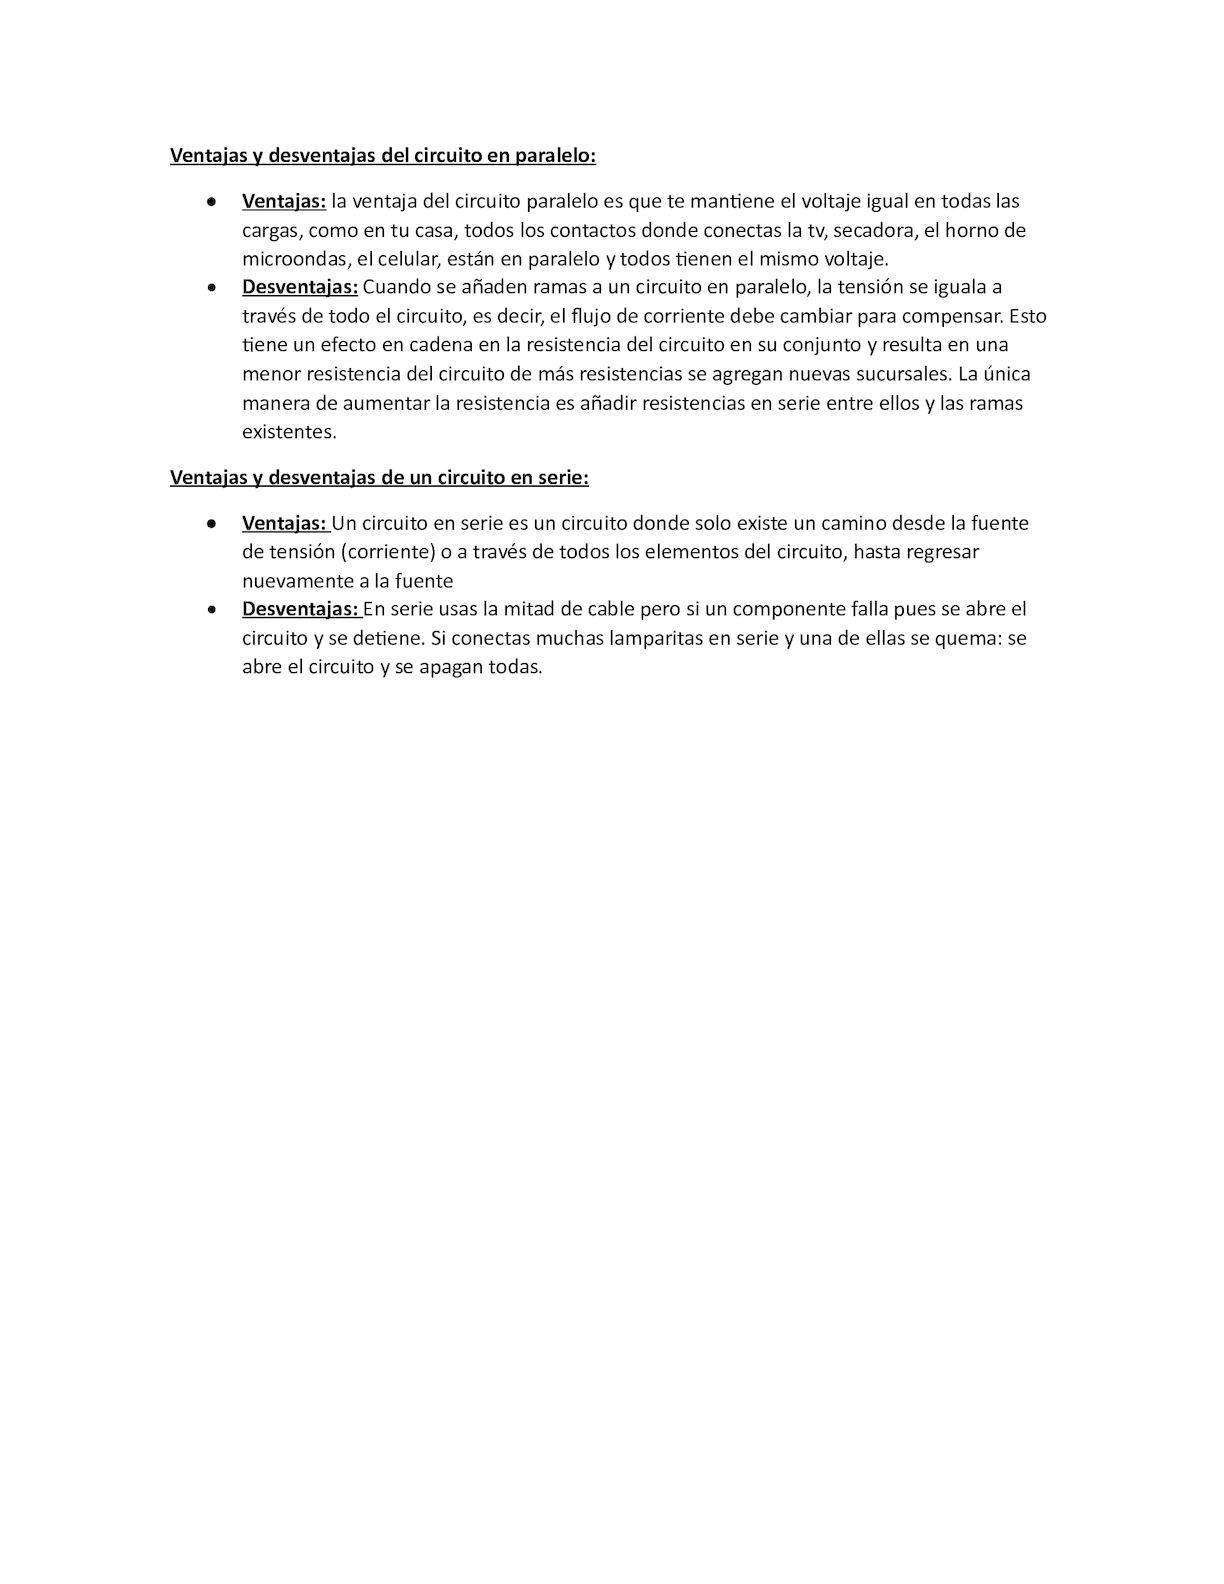 Circuito Seri E Paralelo : Calaméo ventajas y desventajas del circuito en paralelo